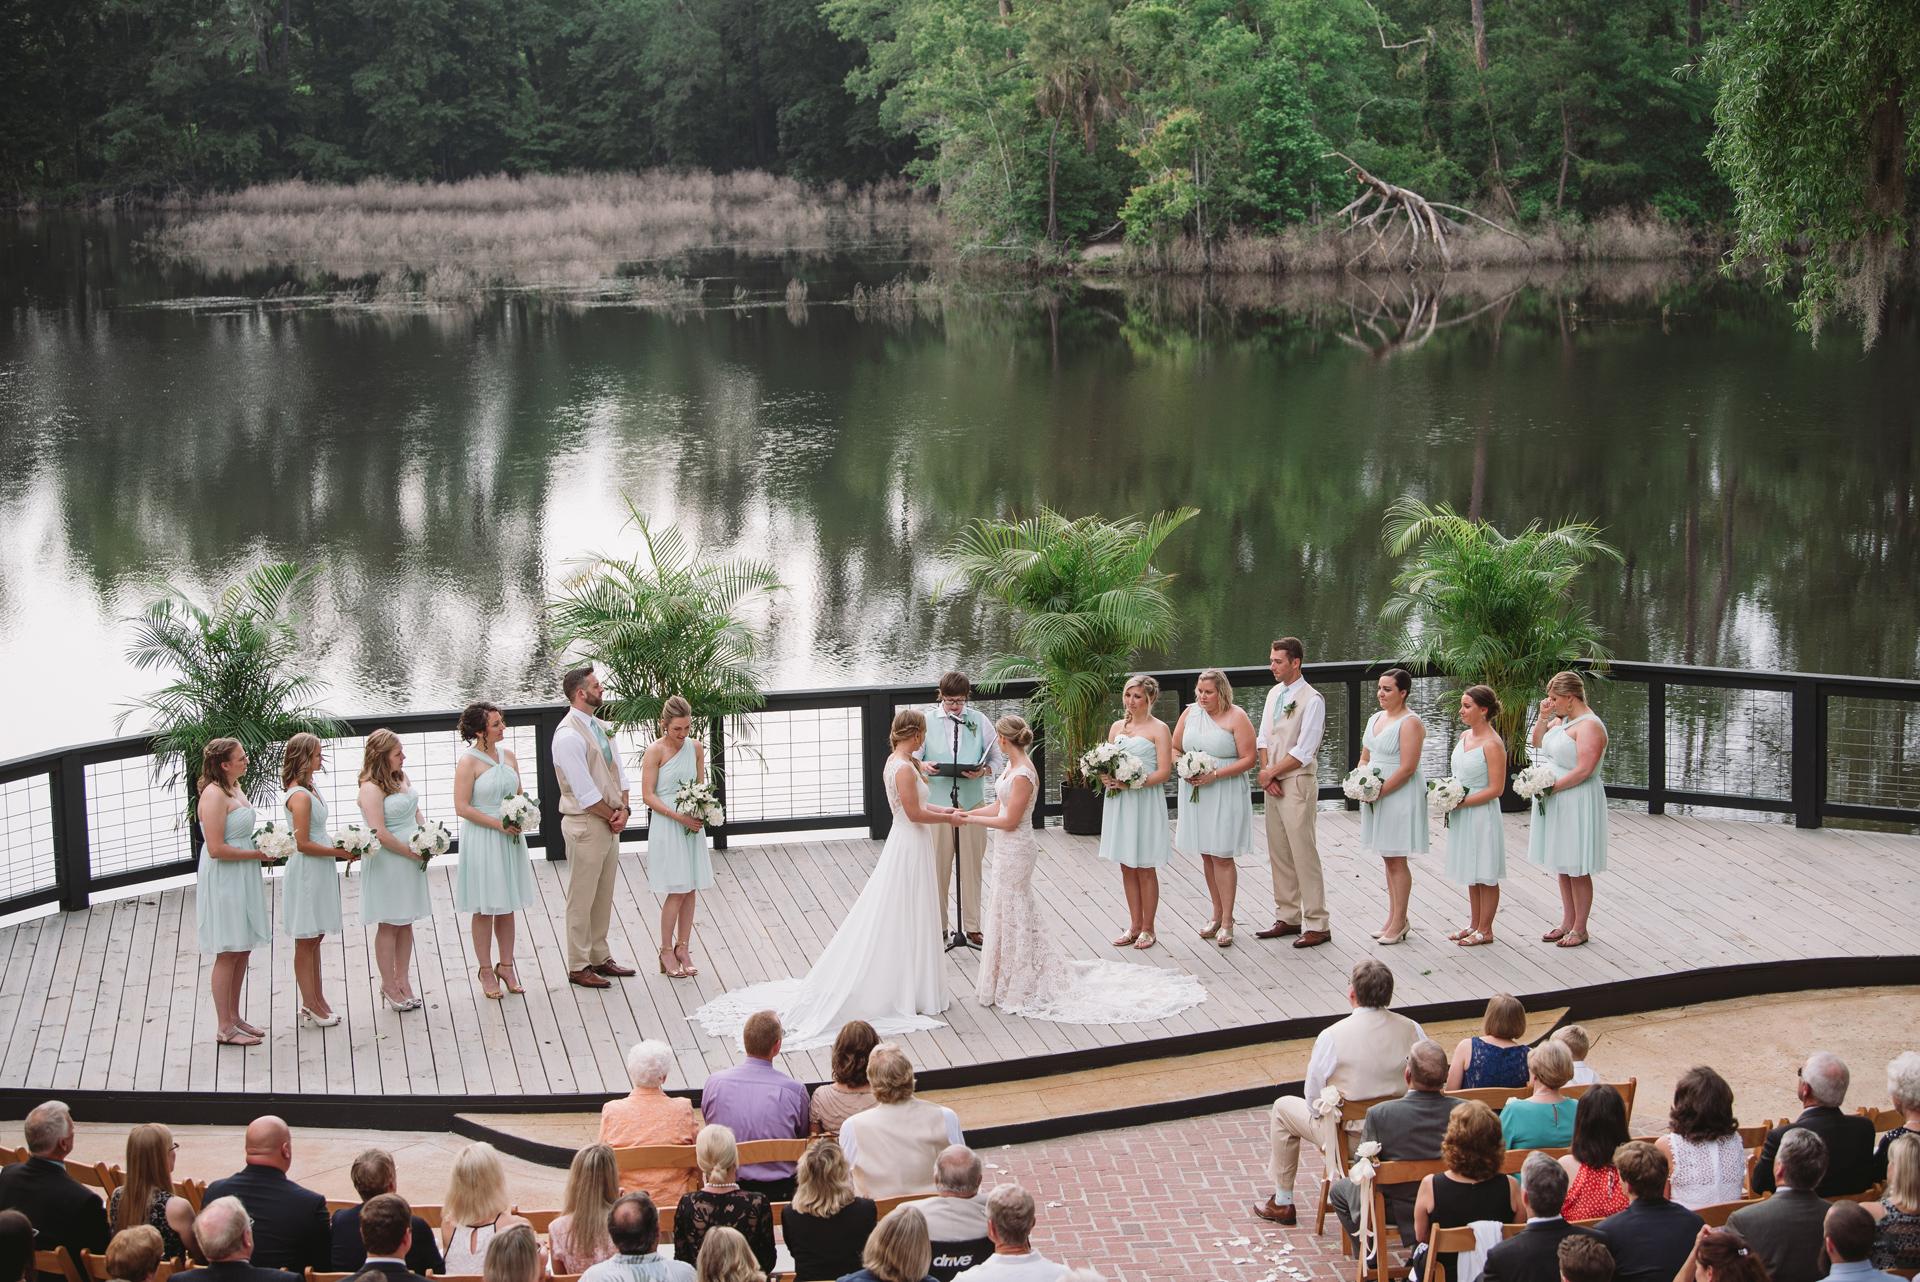 wedding at adams pond